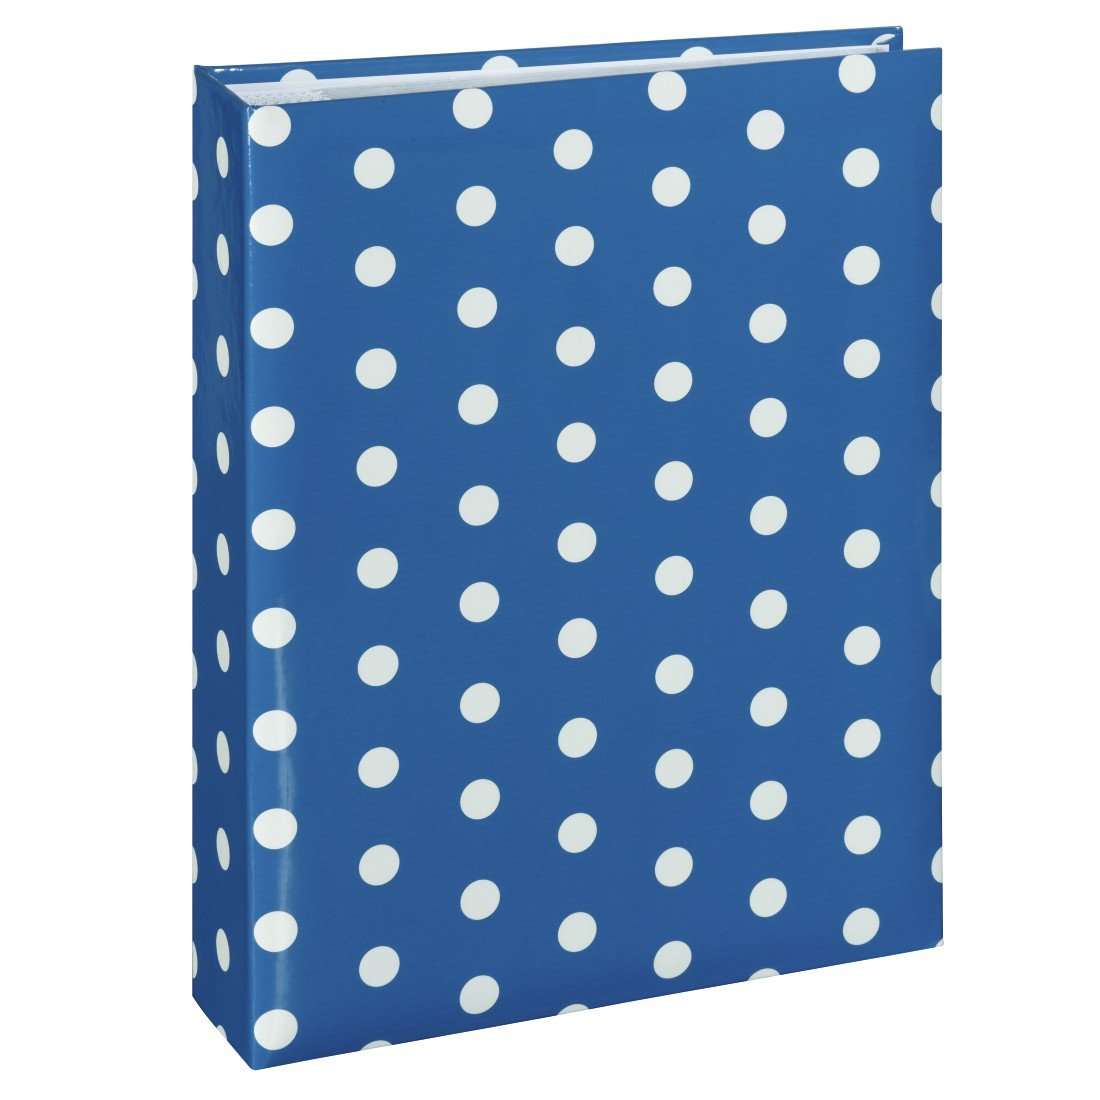 HAMA PUNTIKY 10x15/200, modrá, popisové štítky